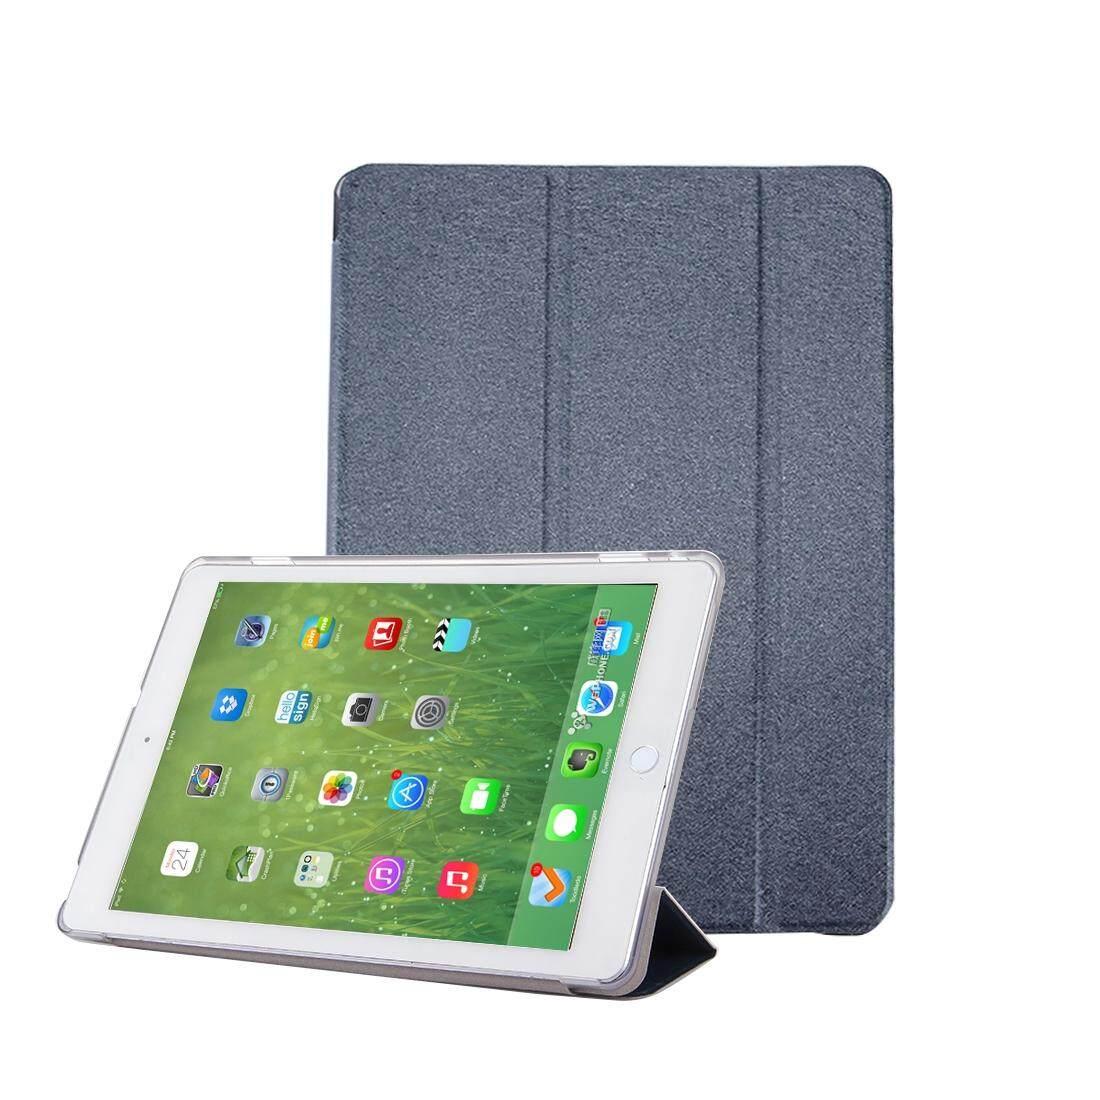 Untuk Huawei MediaPad M3 Lite 10.1 Inch Tekstur Sutra Kulit Horisontal Lipat Case dengan 3-Lipat Penahan & Tidur /Wake-Hingga Fungsi (Gelap Biru) -Internasional